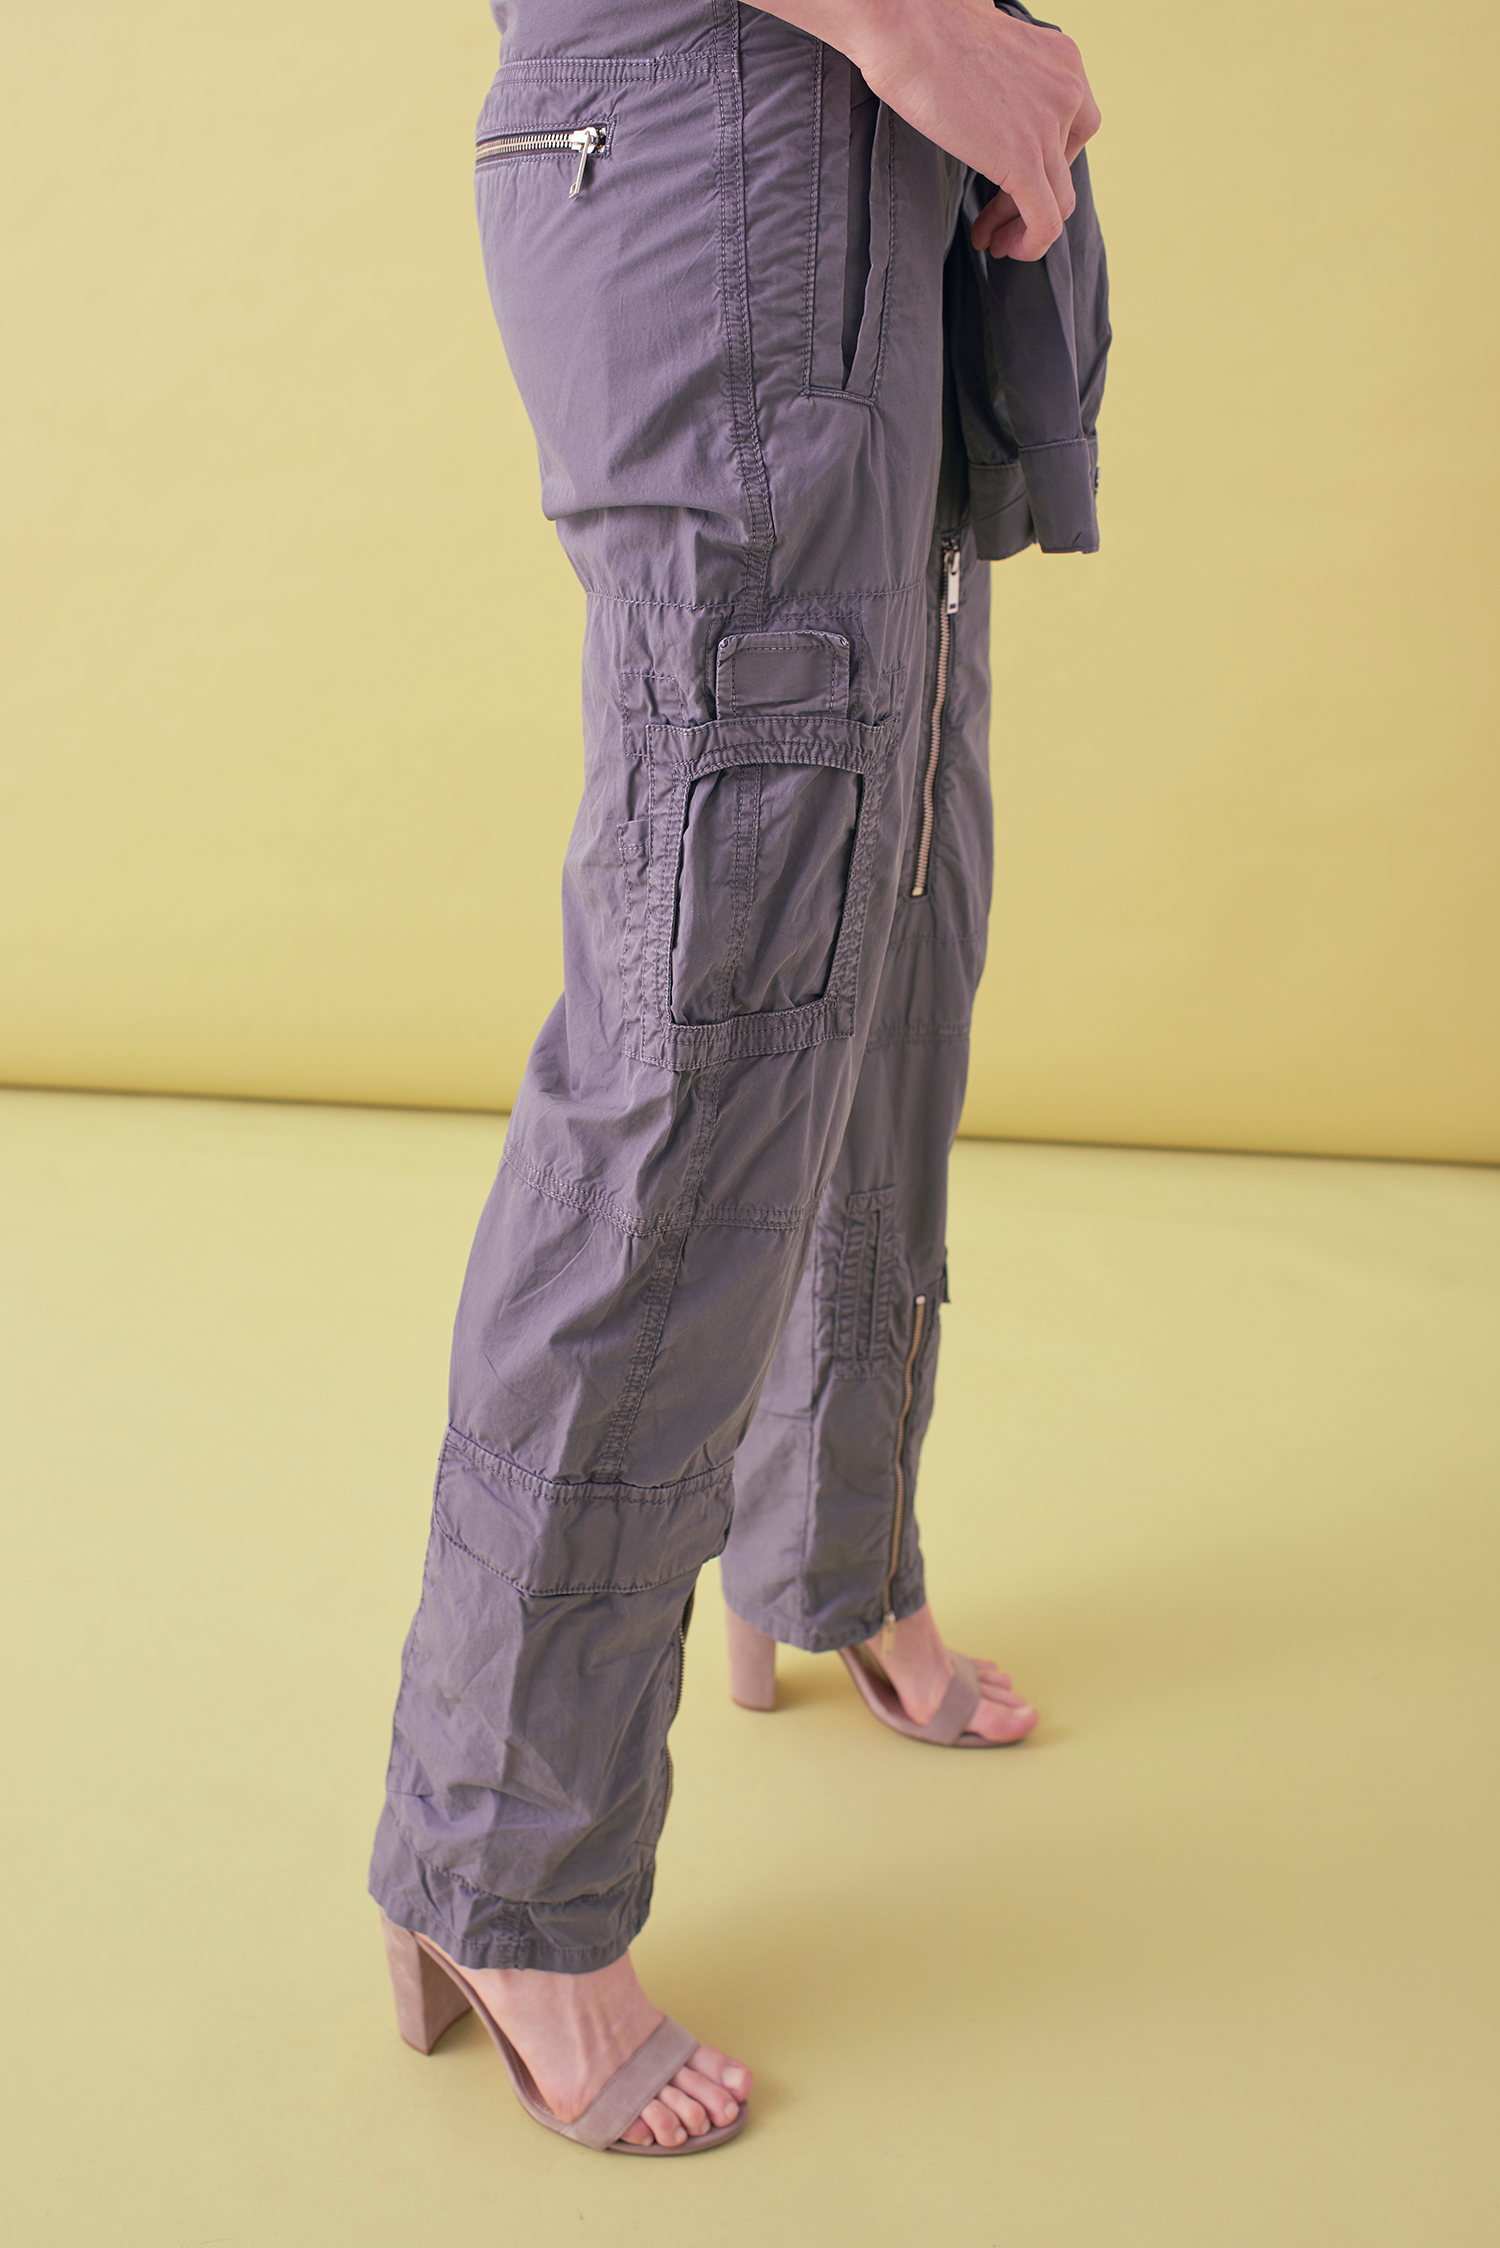 Sarah_Swann_SS17_38_Garment_Dyed_Rayon_Cotton_Utility_Trouser_Pewter_D01.jpg